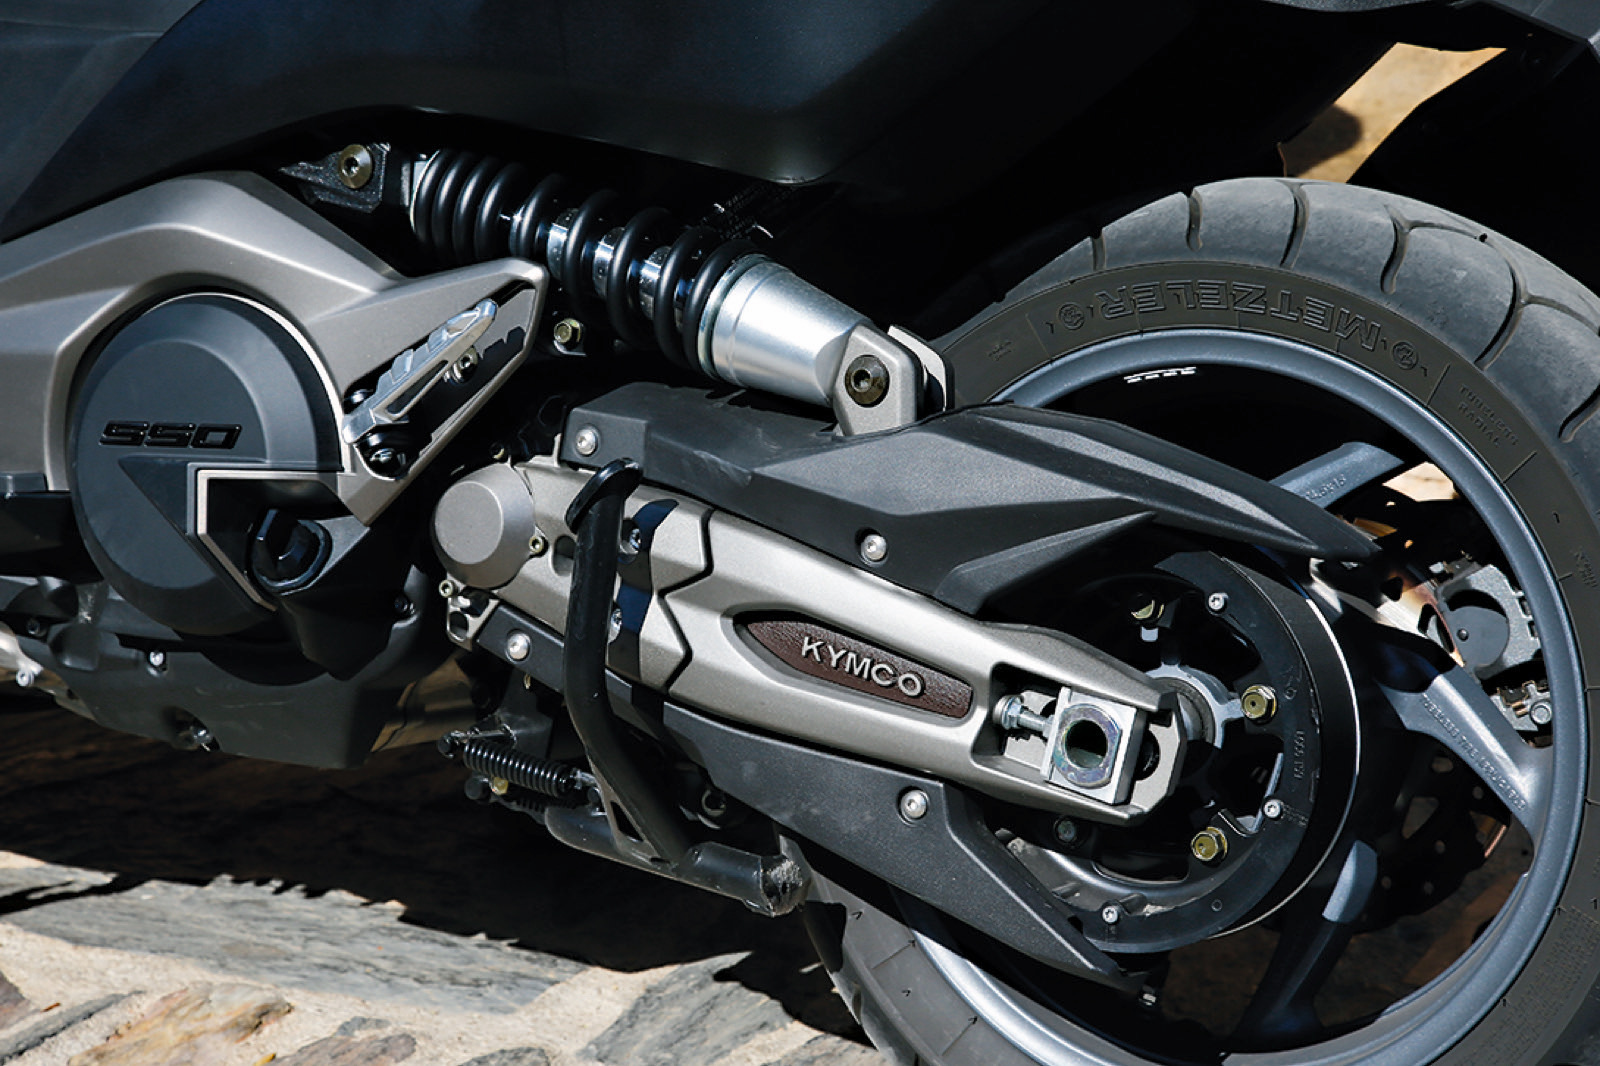 Yamaha TMAX SX vs Kymco AK550